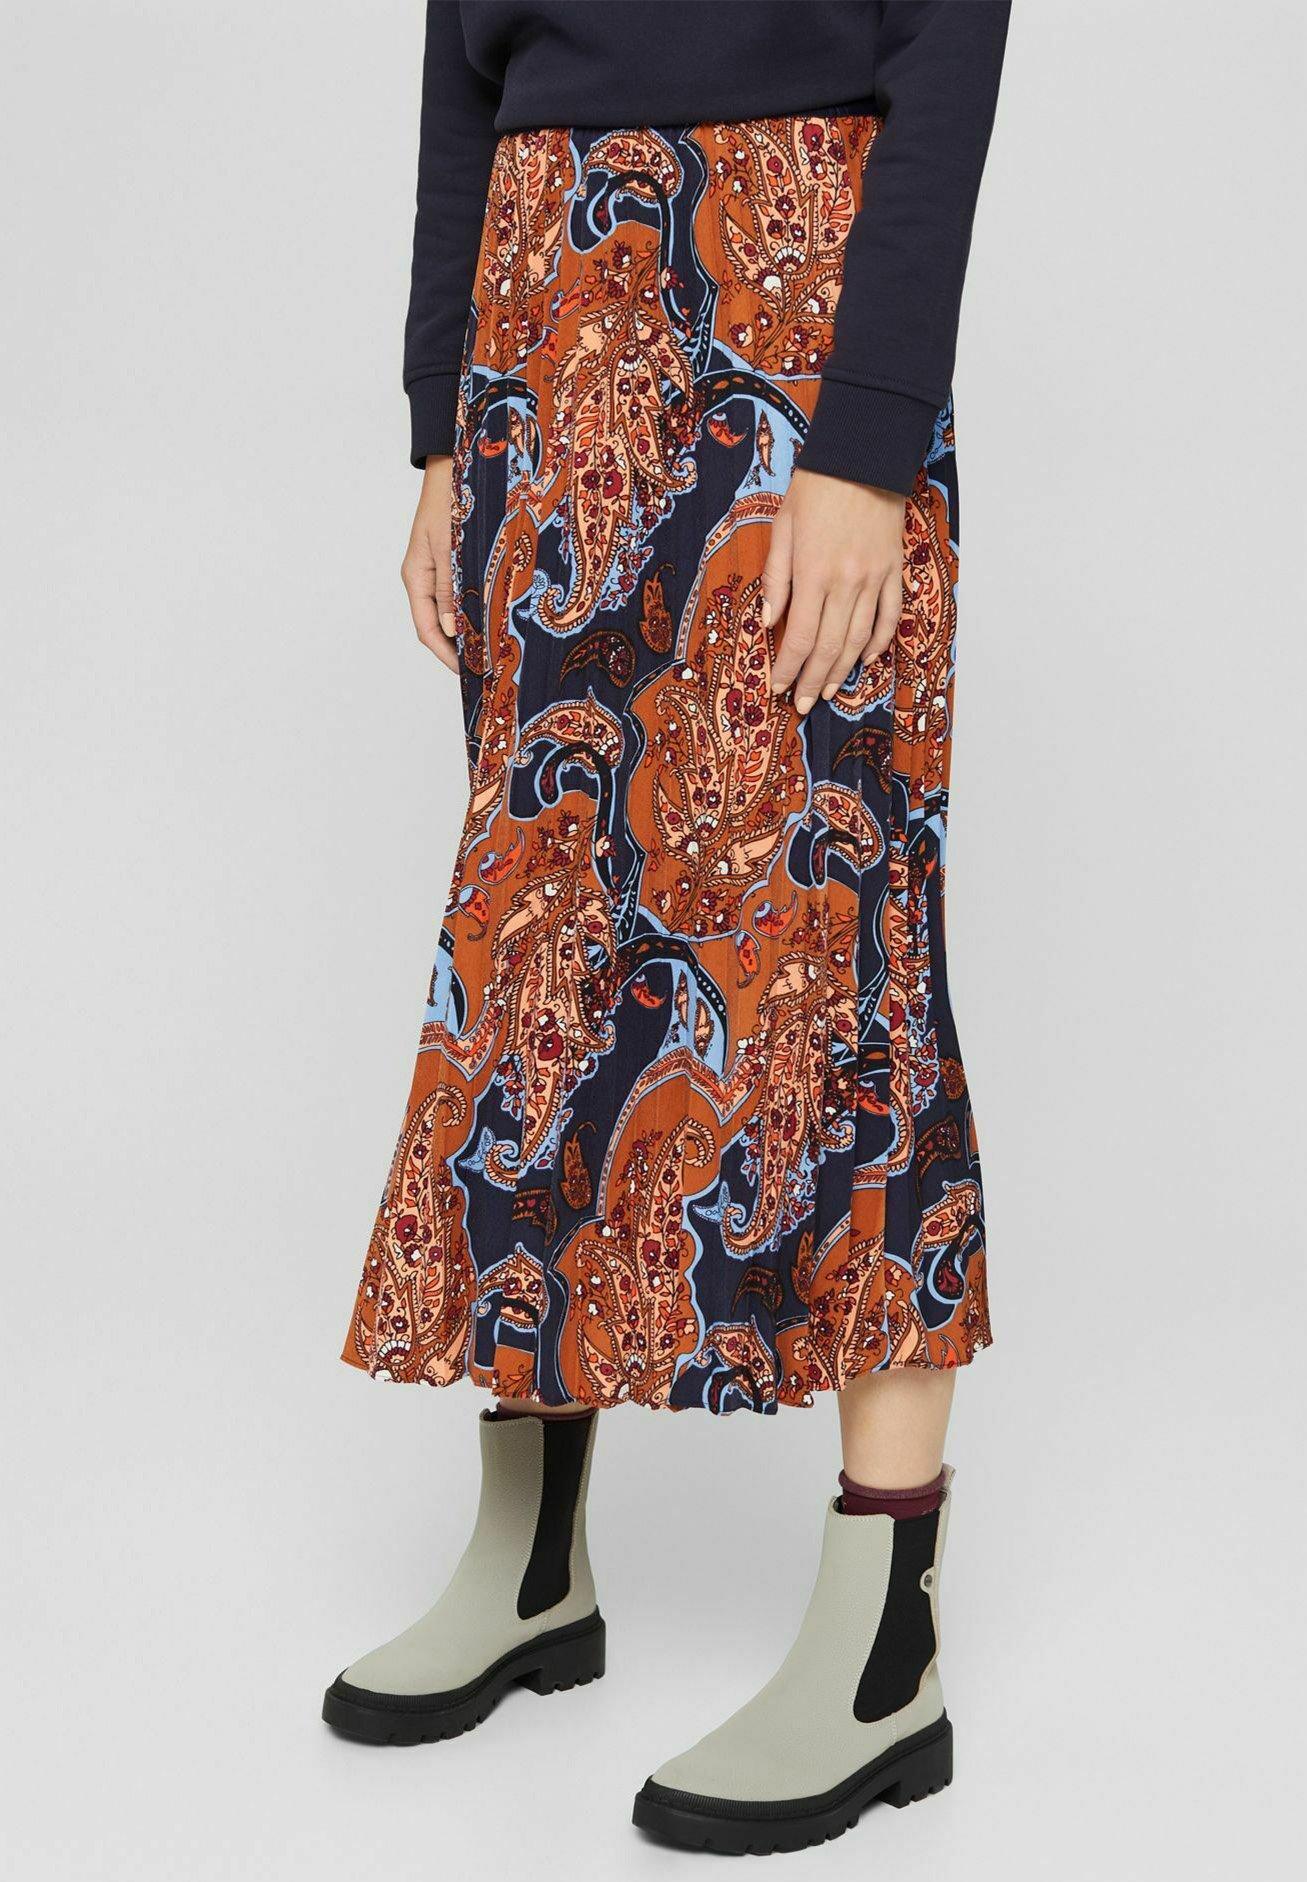 Femme plissierter Midi mit Paisleyprint - Jupe trapèze